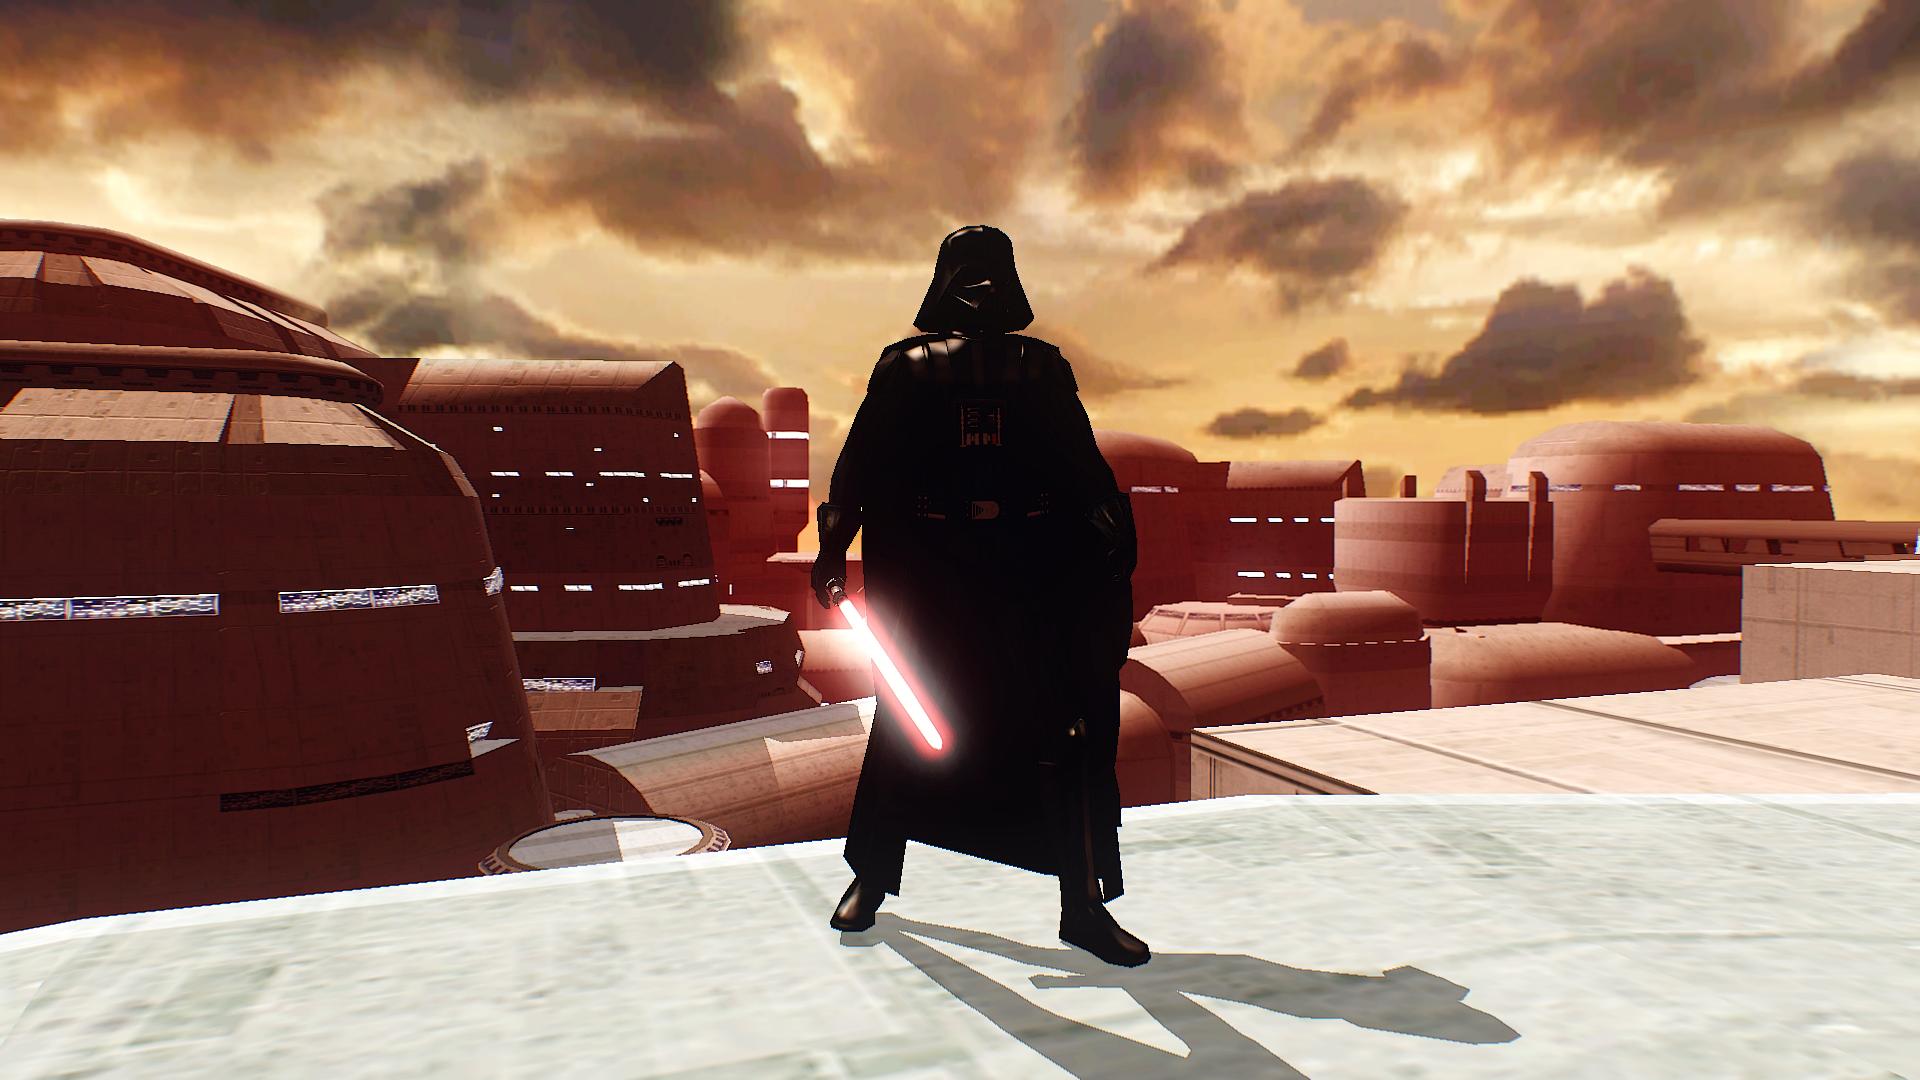 Darth Vader 2017 Hd Graphics Mod Harrisonfog